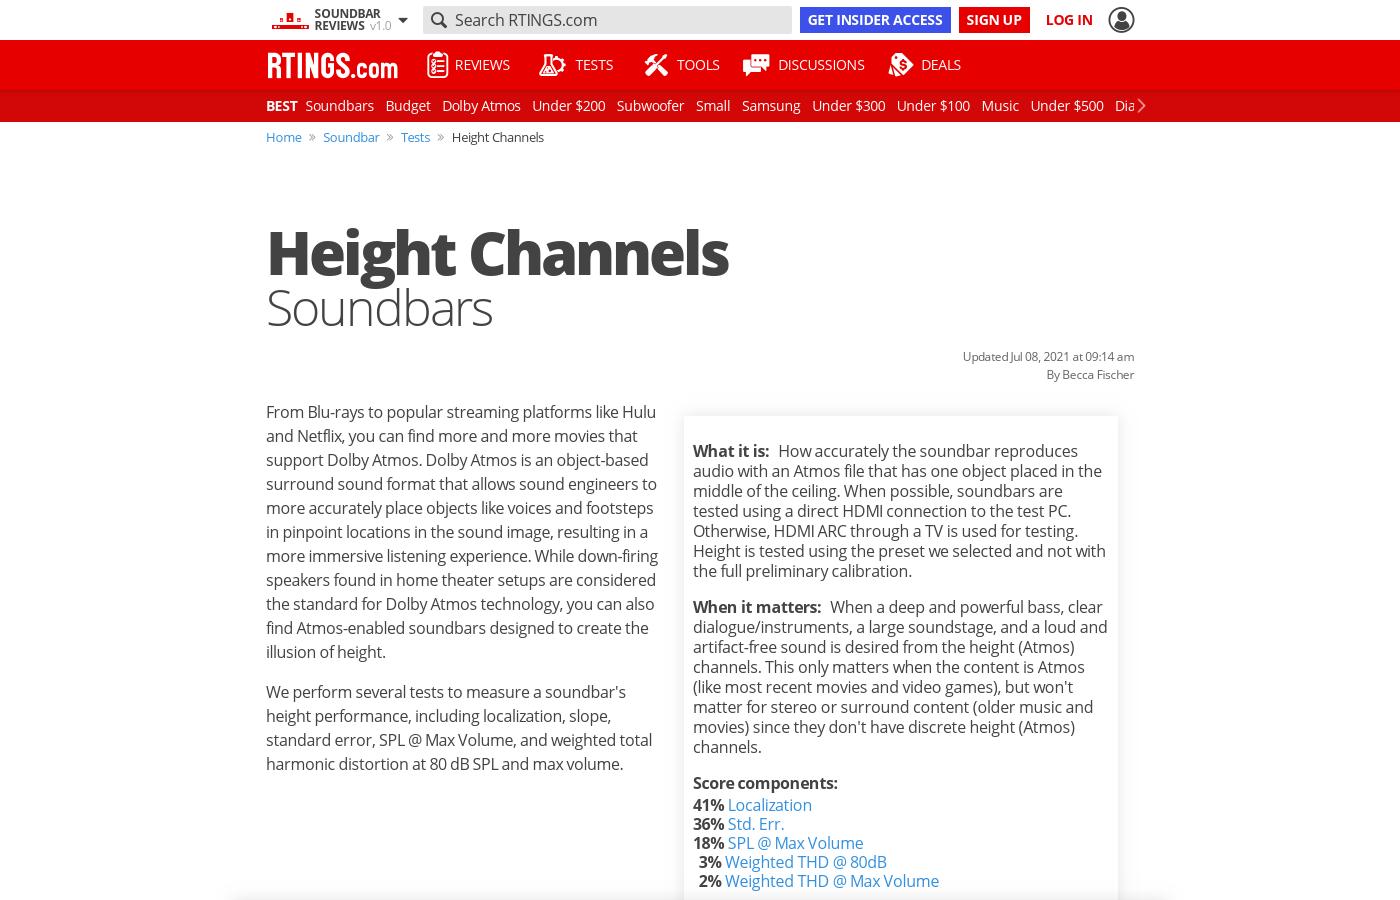 Height Channels: Soundbars